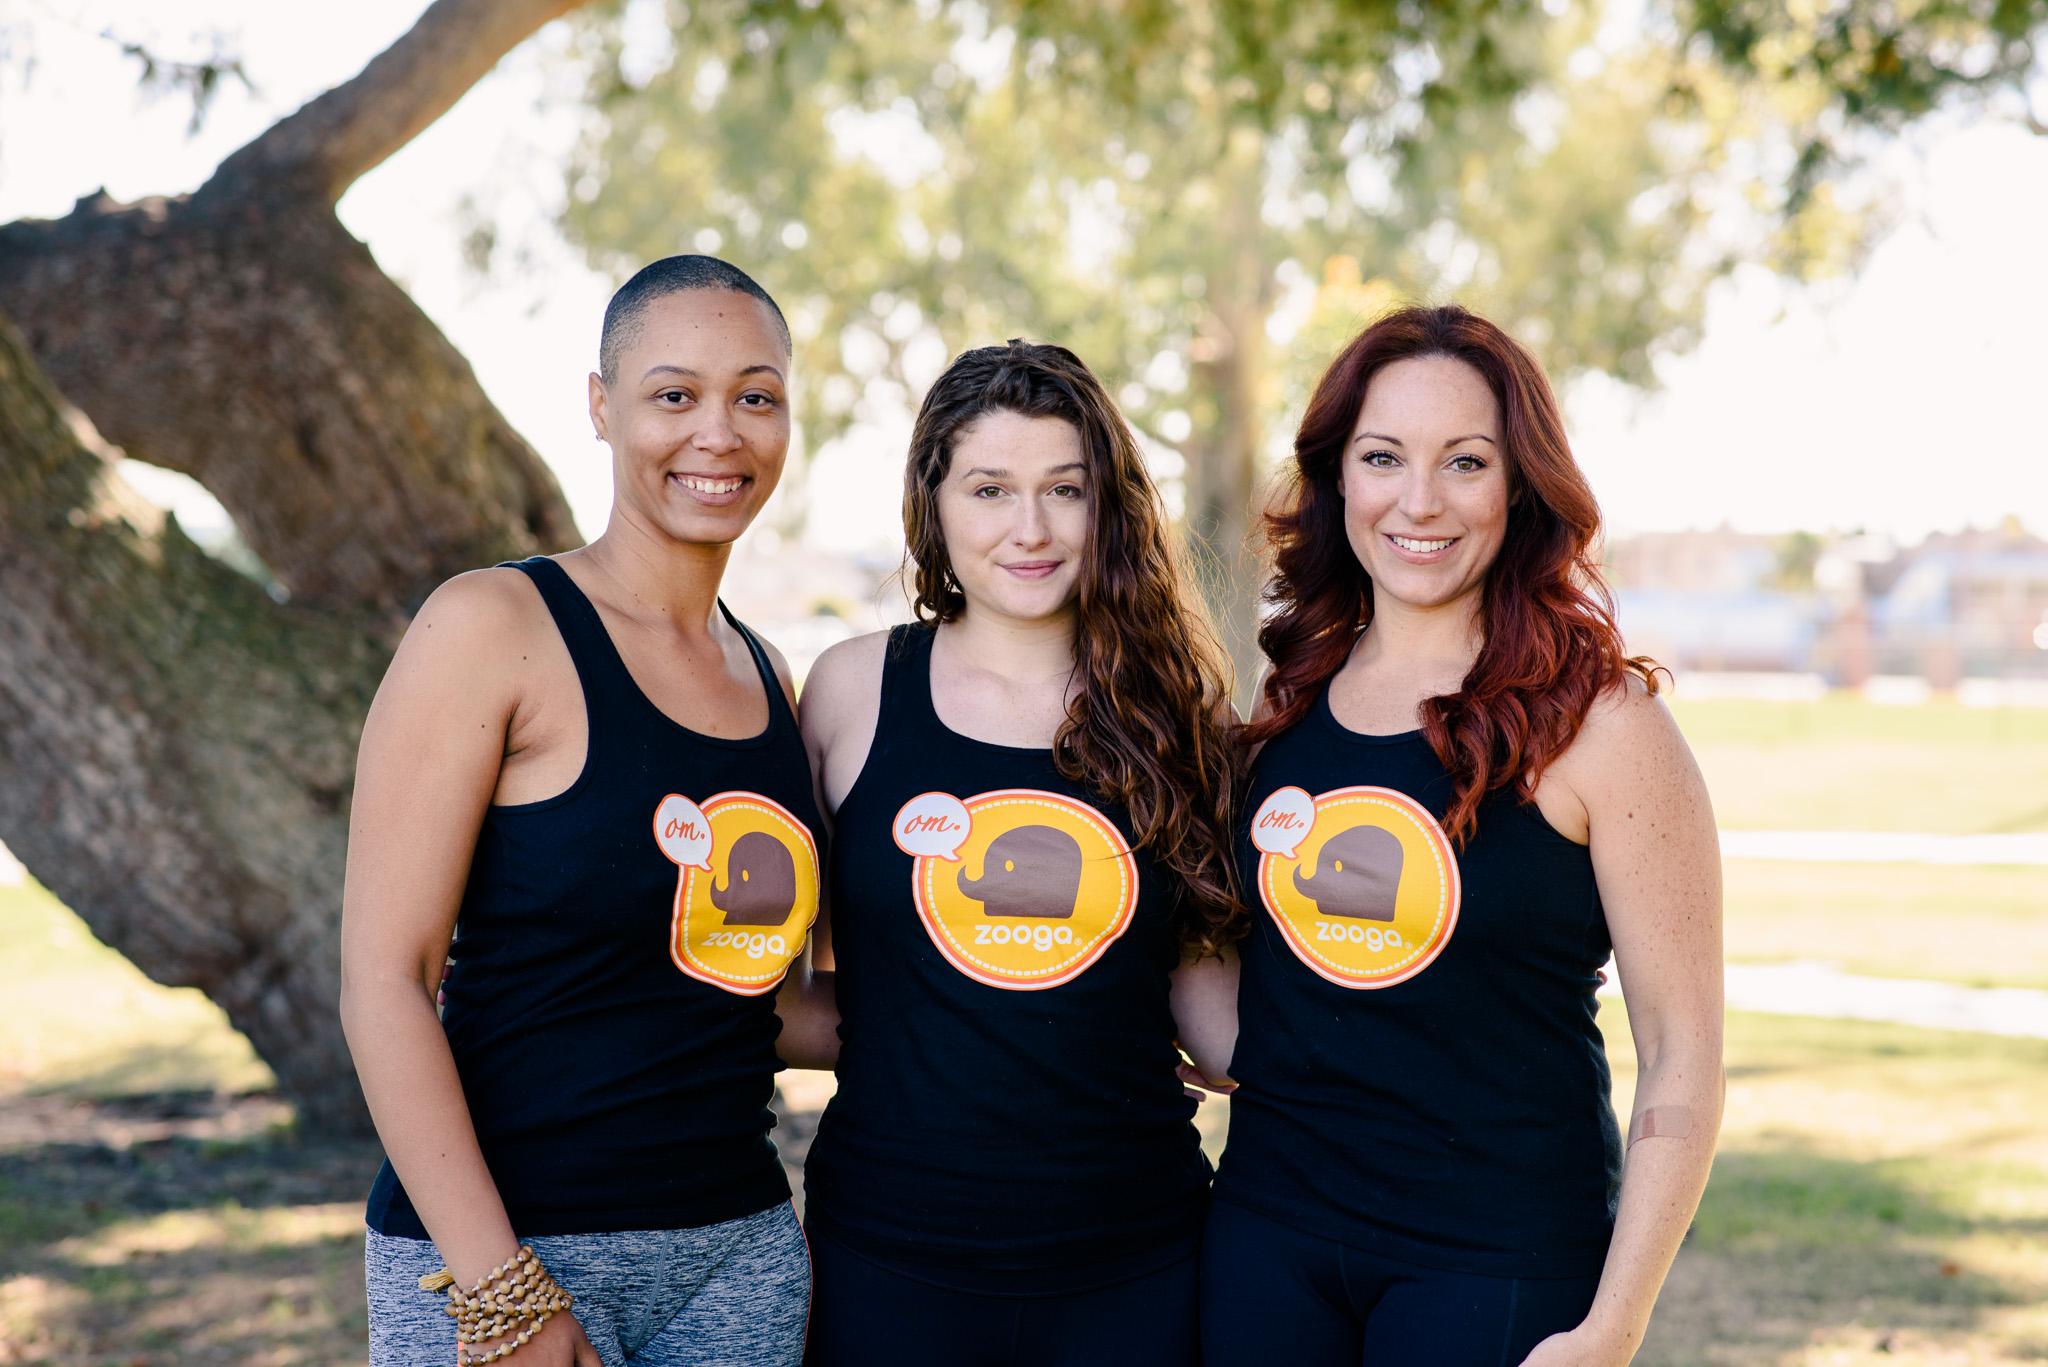 Zooga Yoga South Bay staff